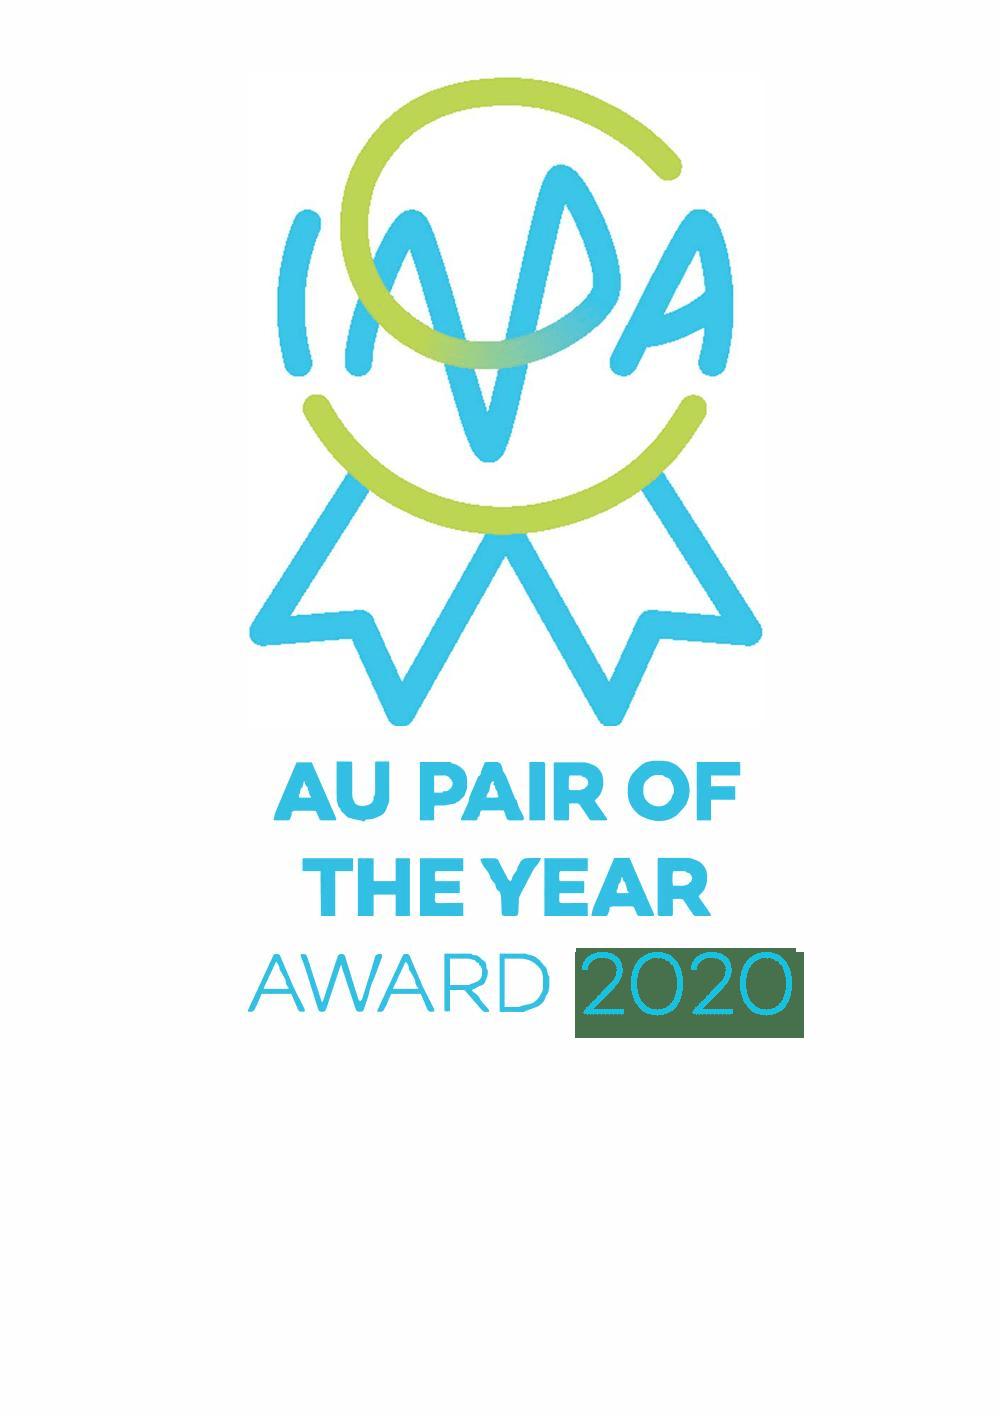 IAPA 2020 Au Pair of the Year Award: Meet the finalists